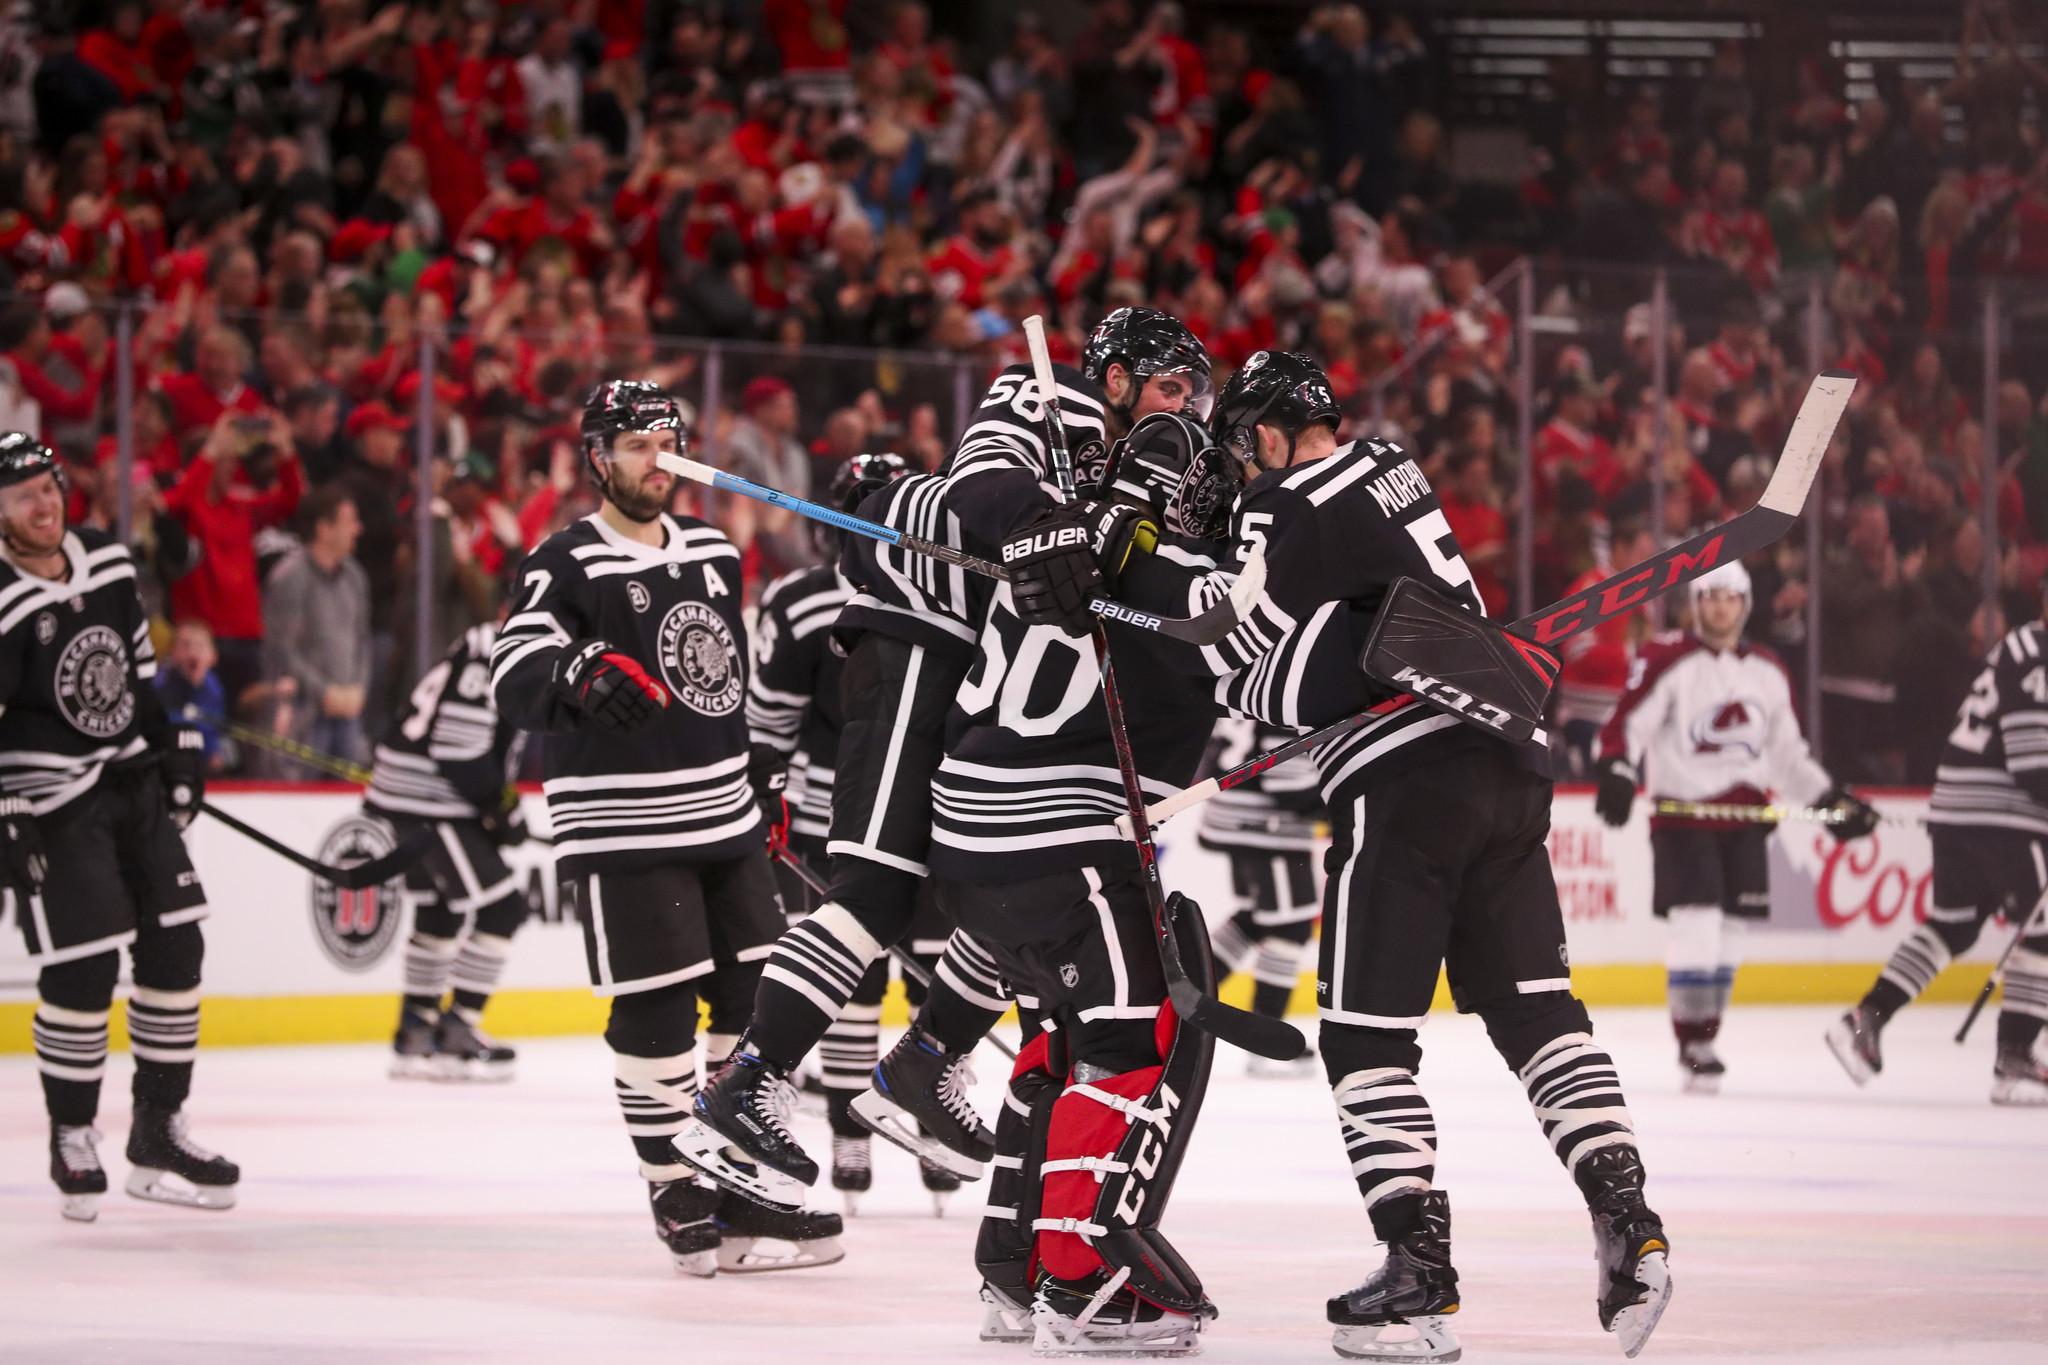 Blackhawks 2, Avalanche 1 (OT)